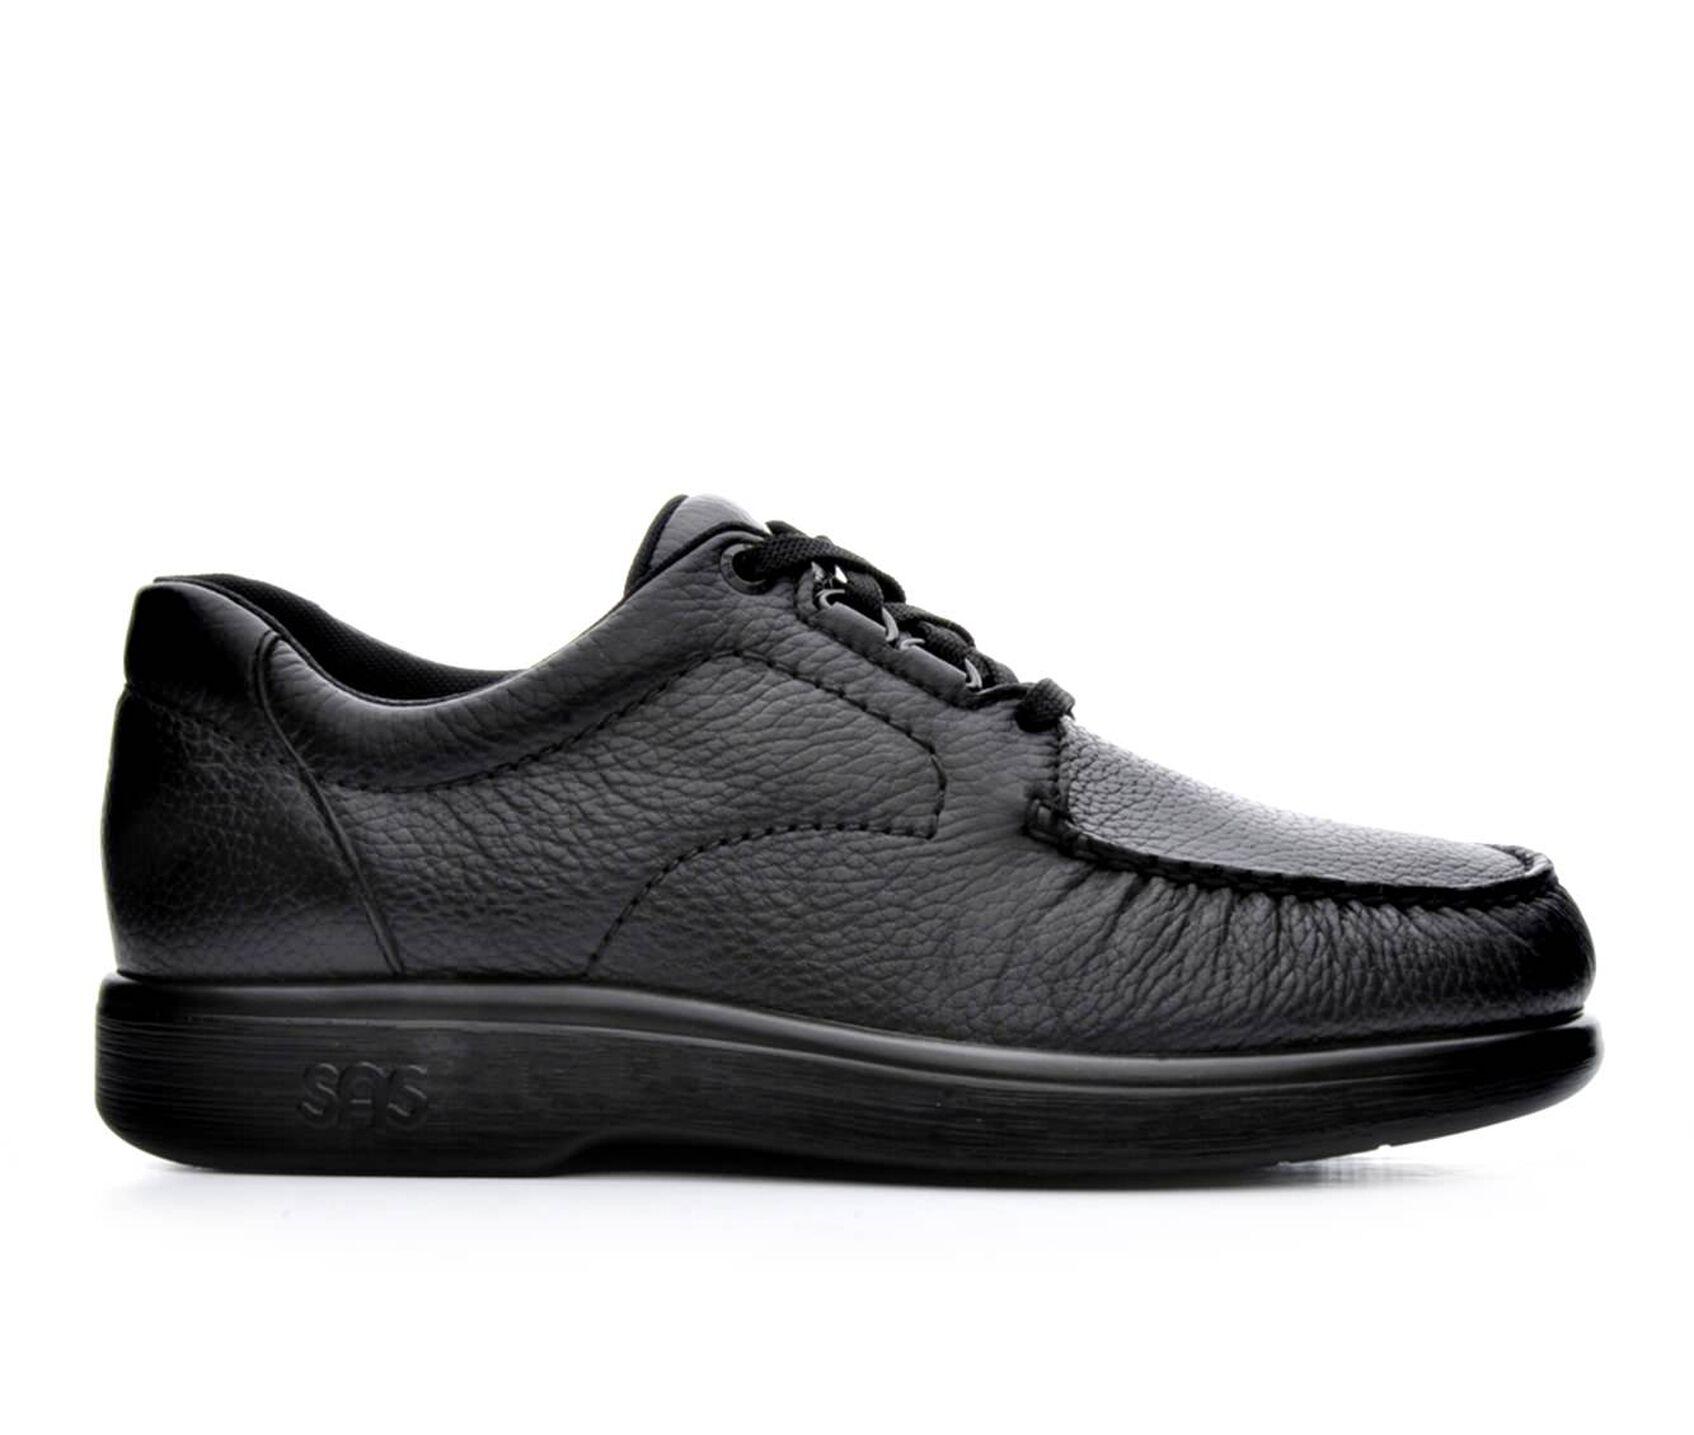 d4f4a24fce Men's Sas Bout Time | Shoe Carnival